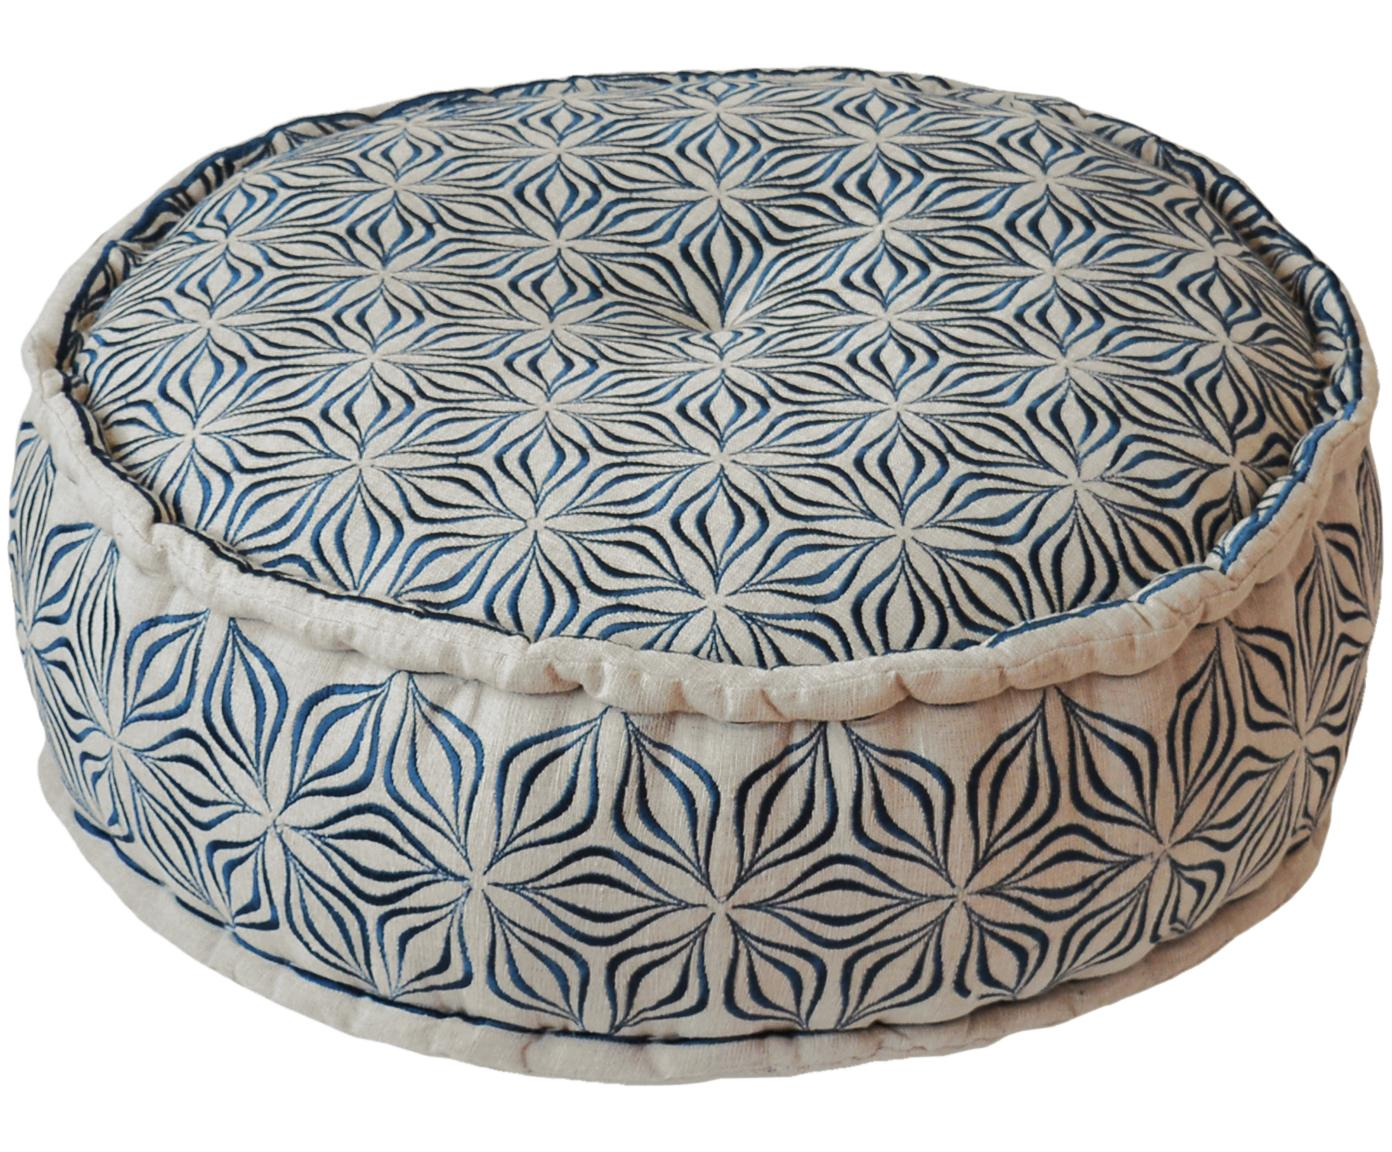 Cojín de suelo redondo de lino Martha, Gris antracita, Ø 60 x Al 20 cm